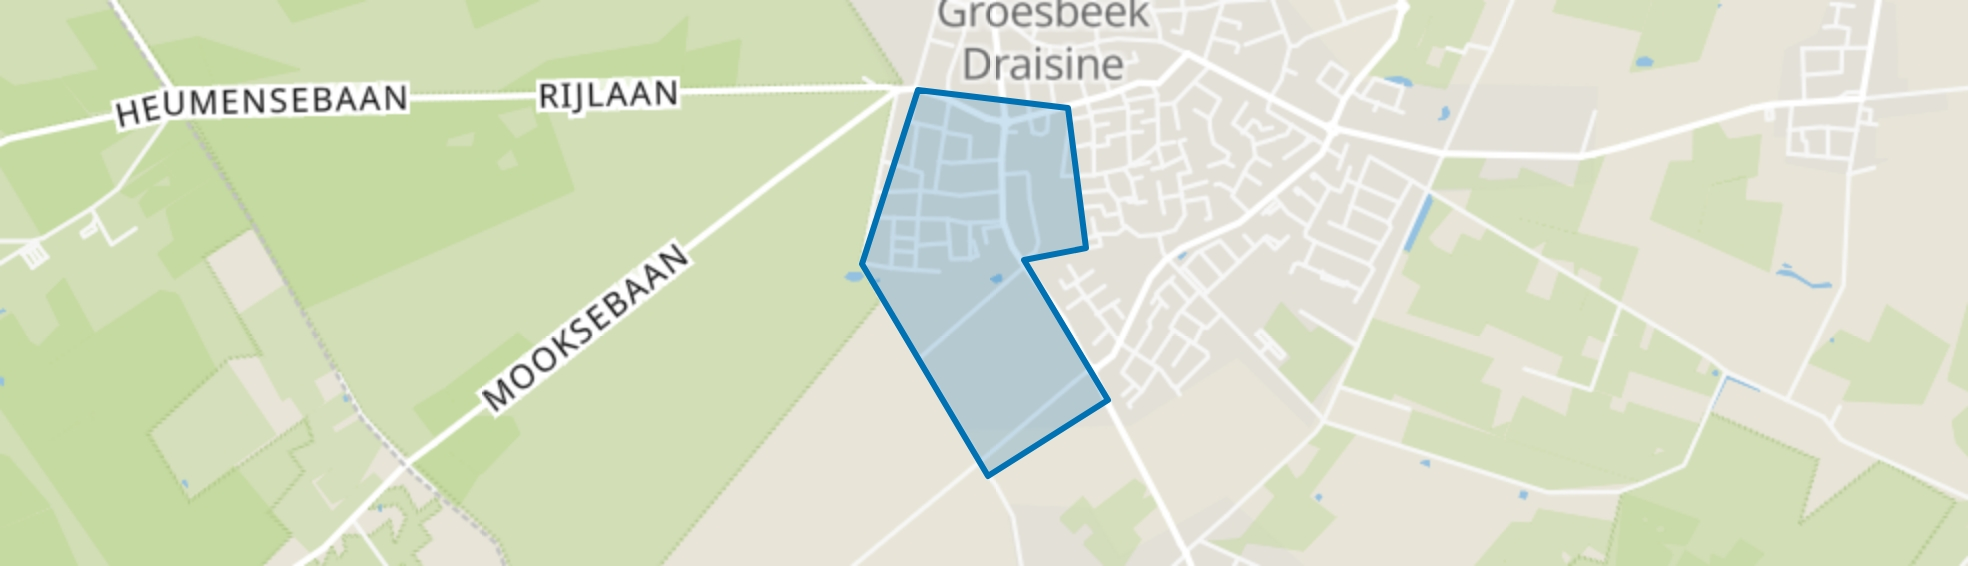 Groesbeek De Drul-West, Groesbeek map